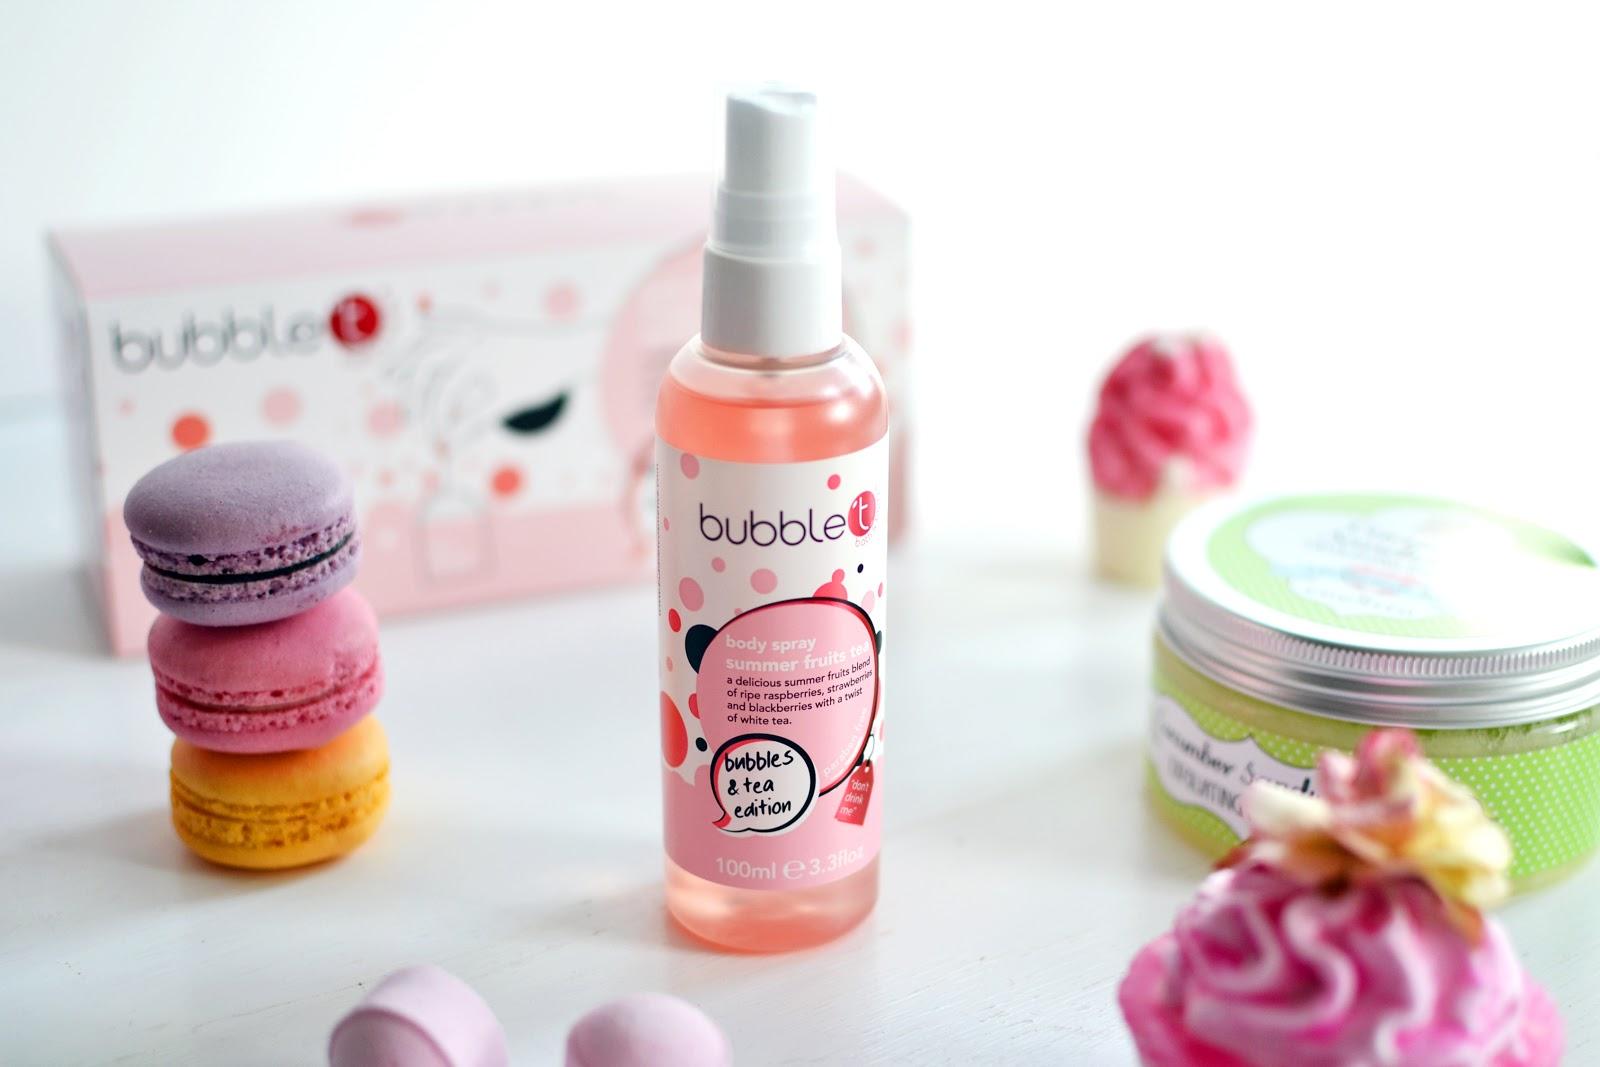 bubble t cosmetics body spray